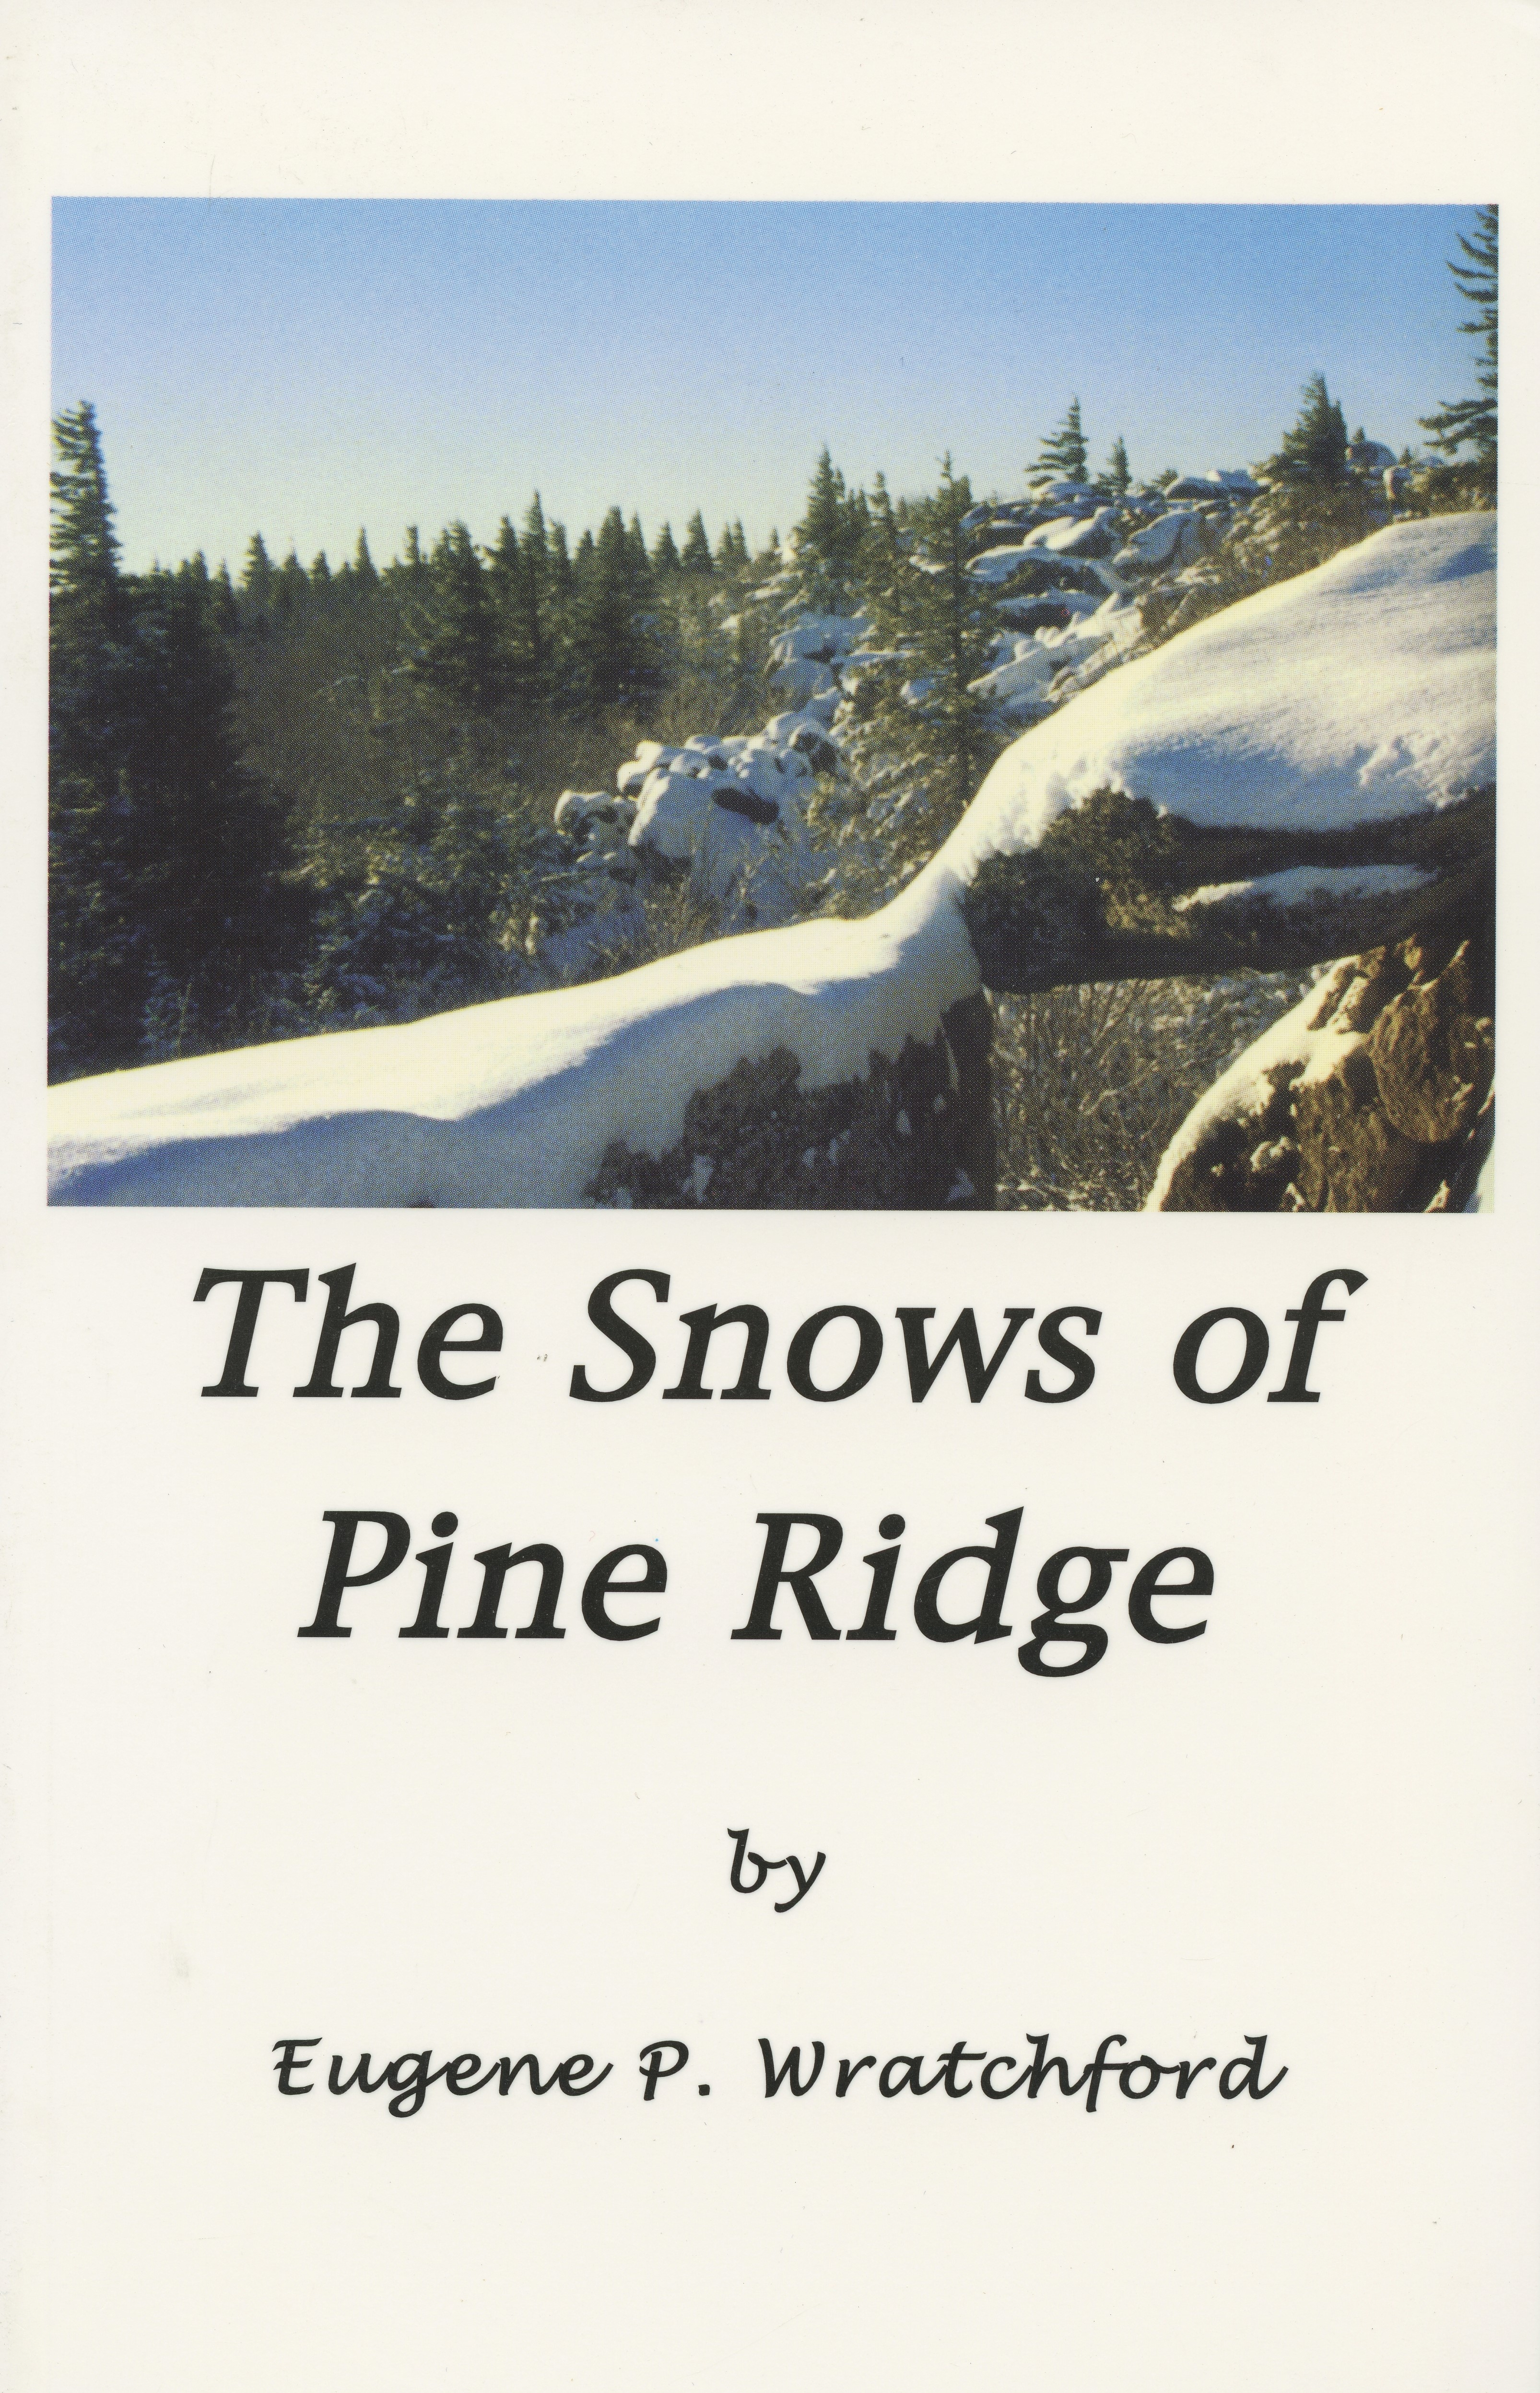 The Snows of Pine Ridge